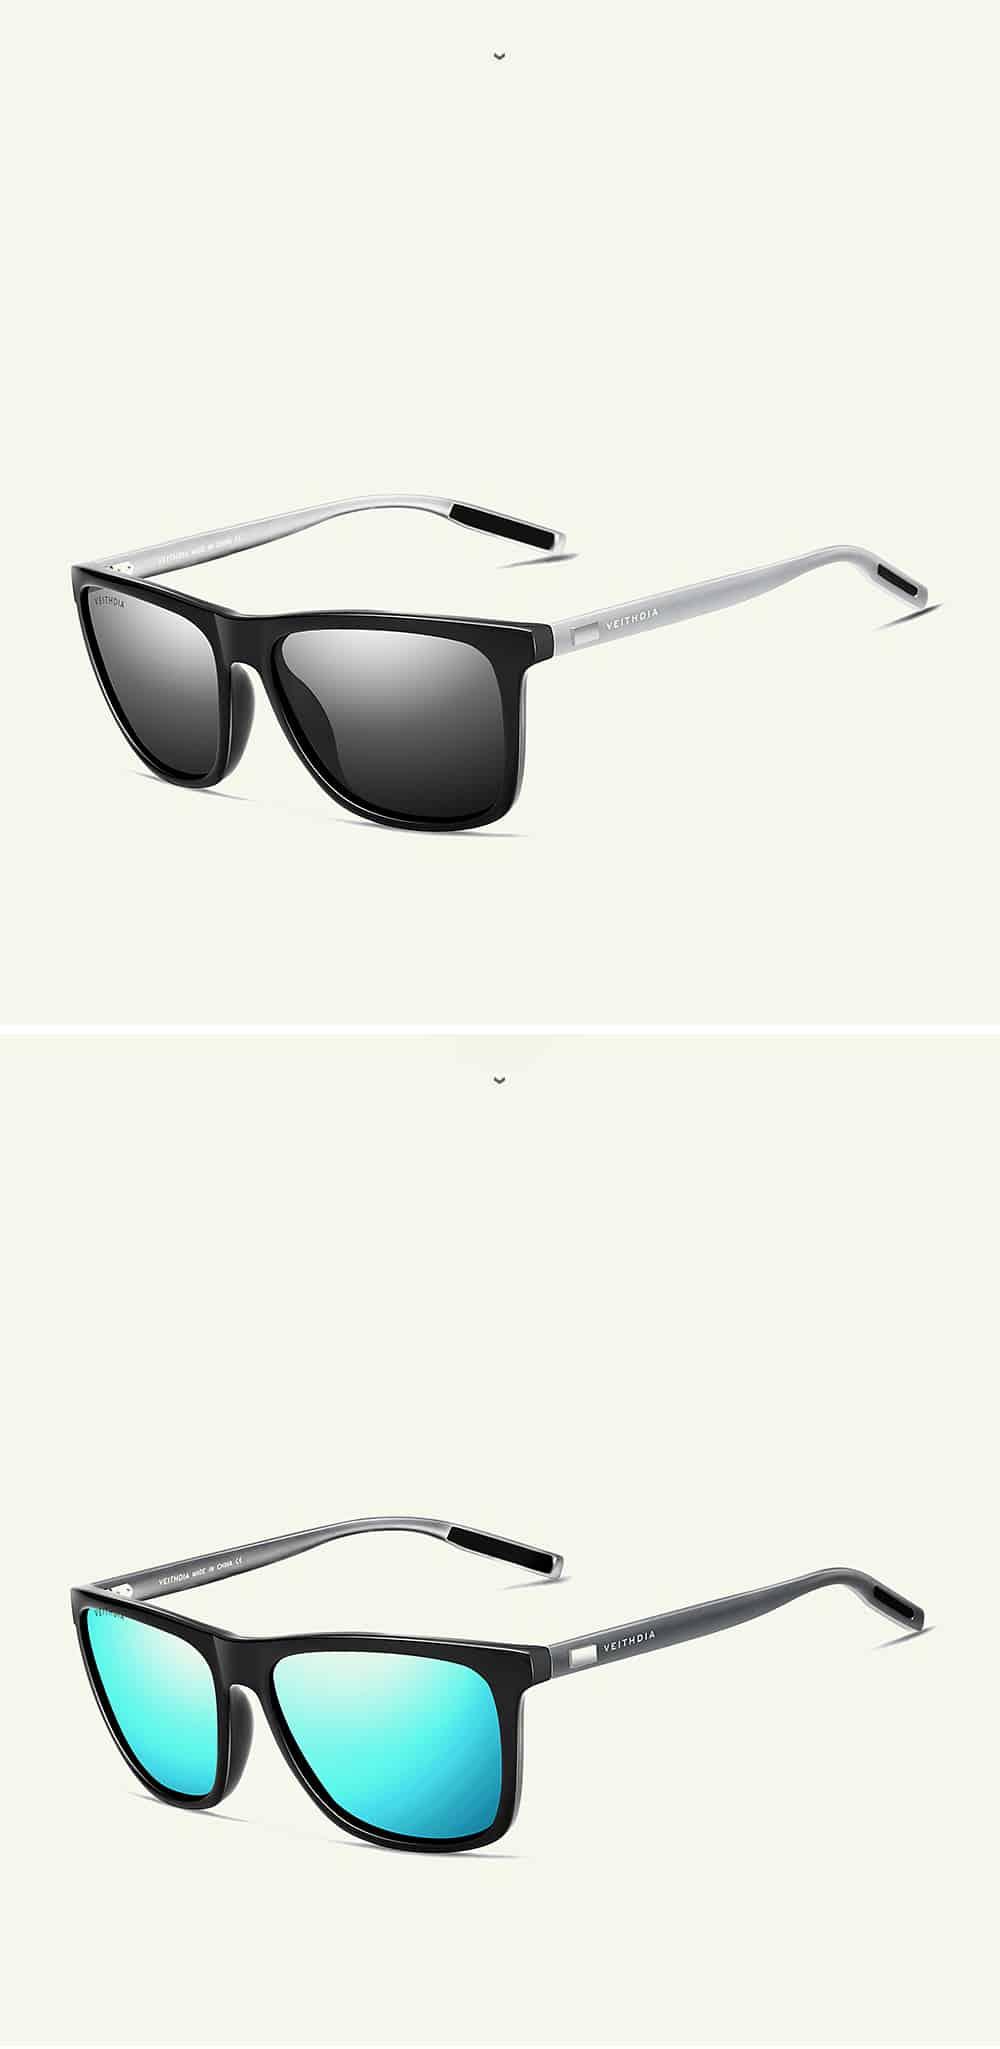 high quality replica sunglasses aliexpress